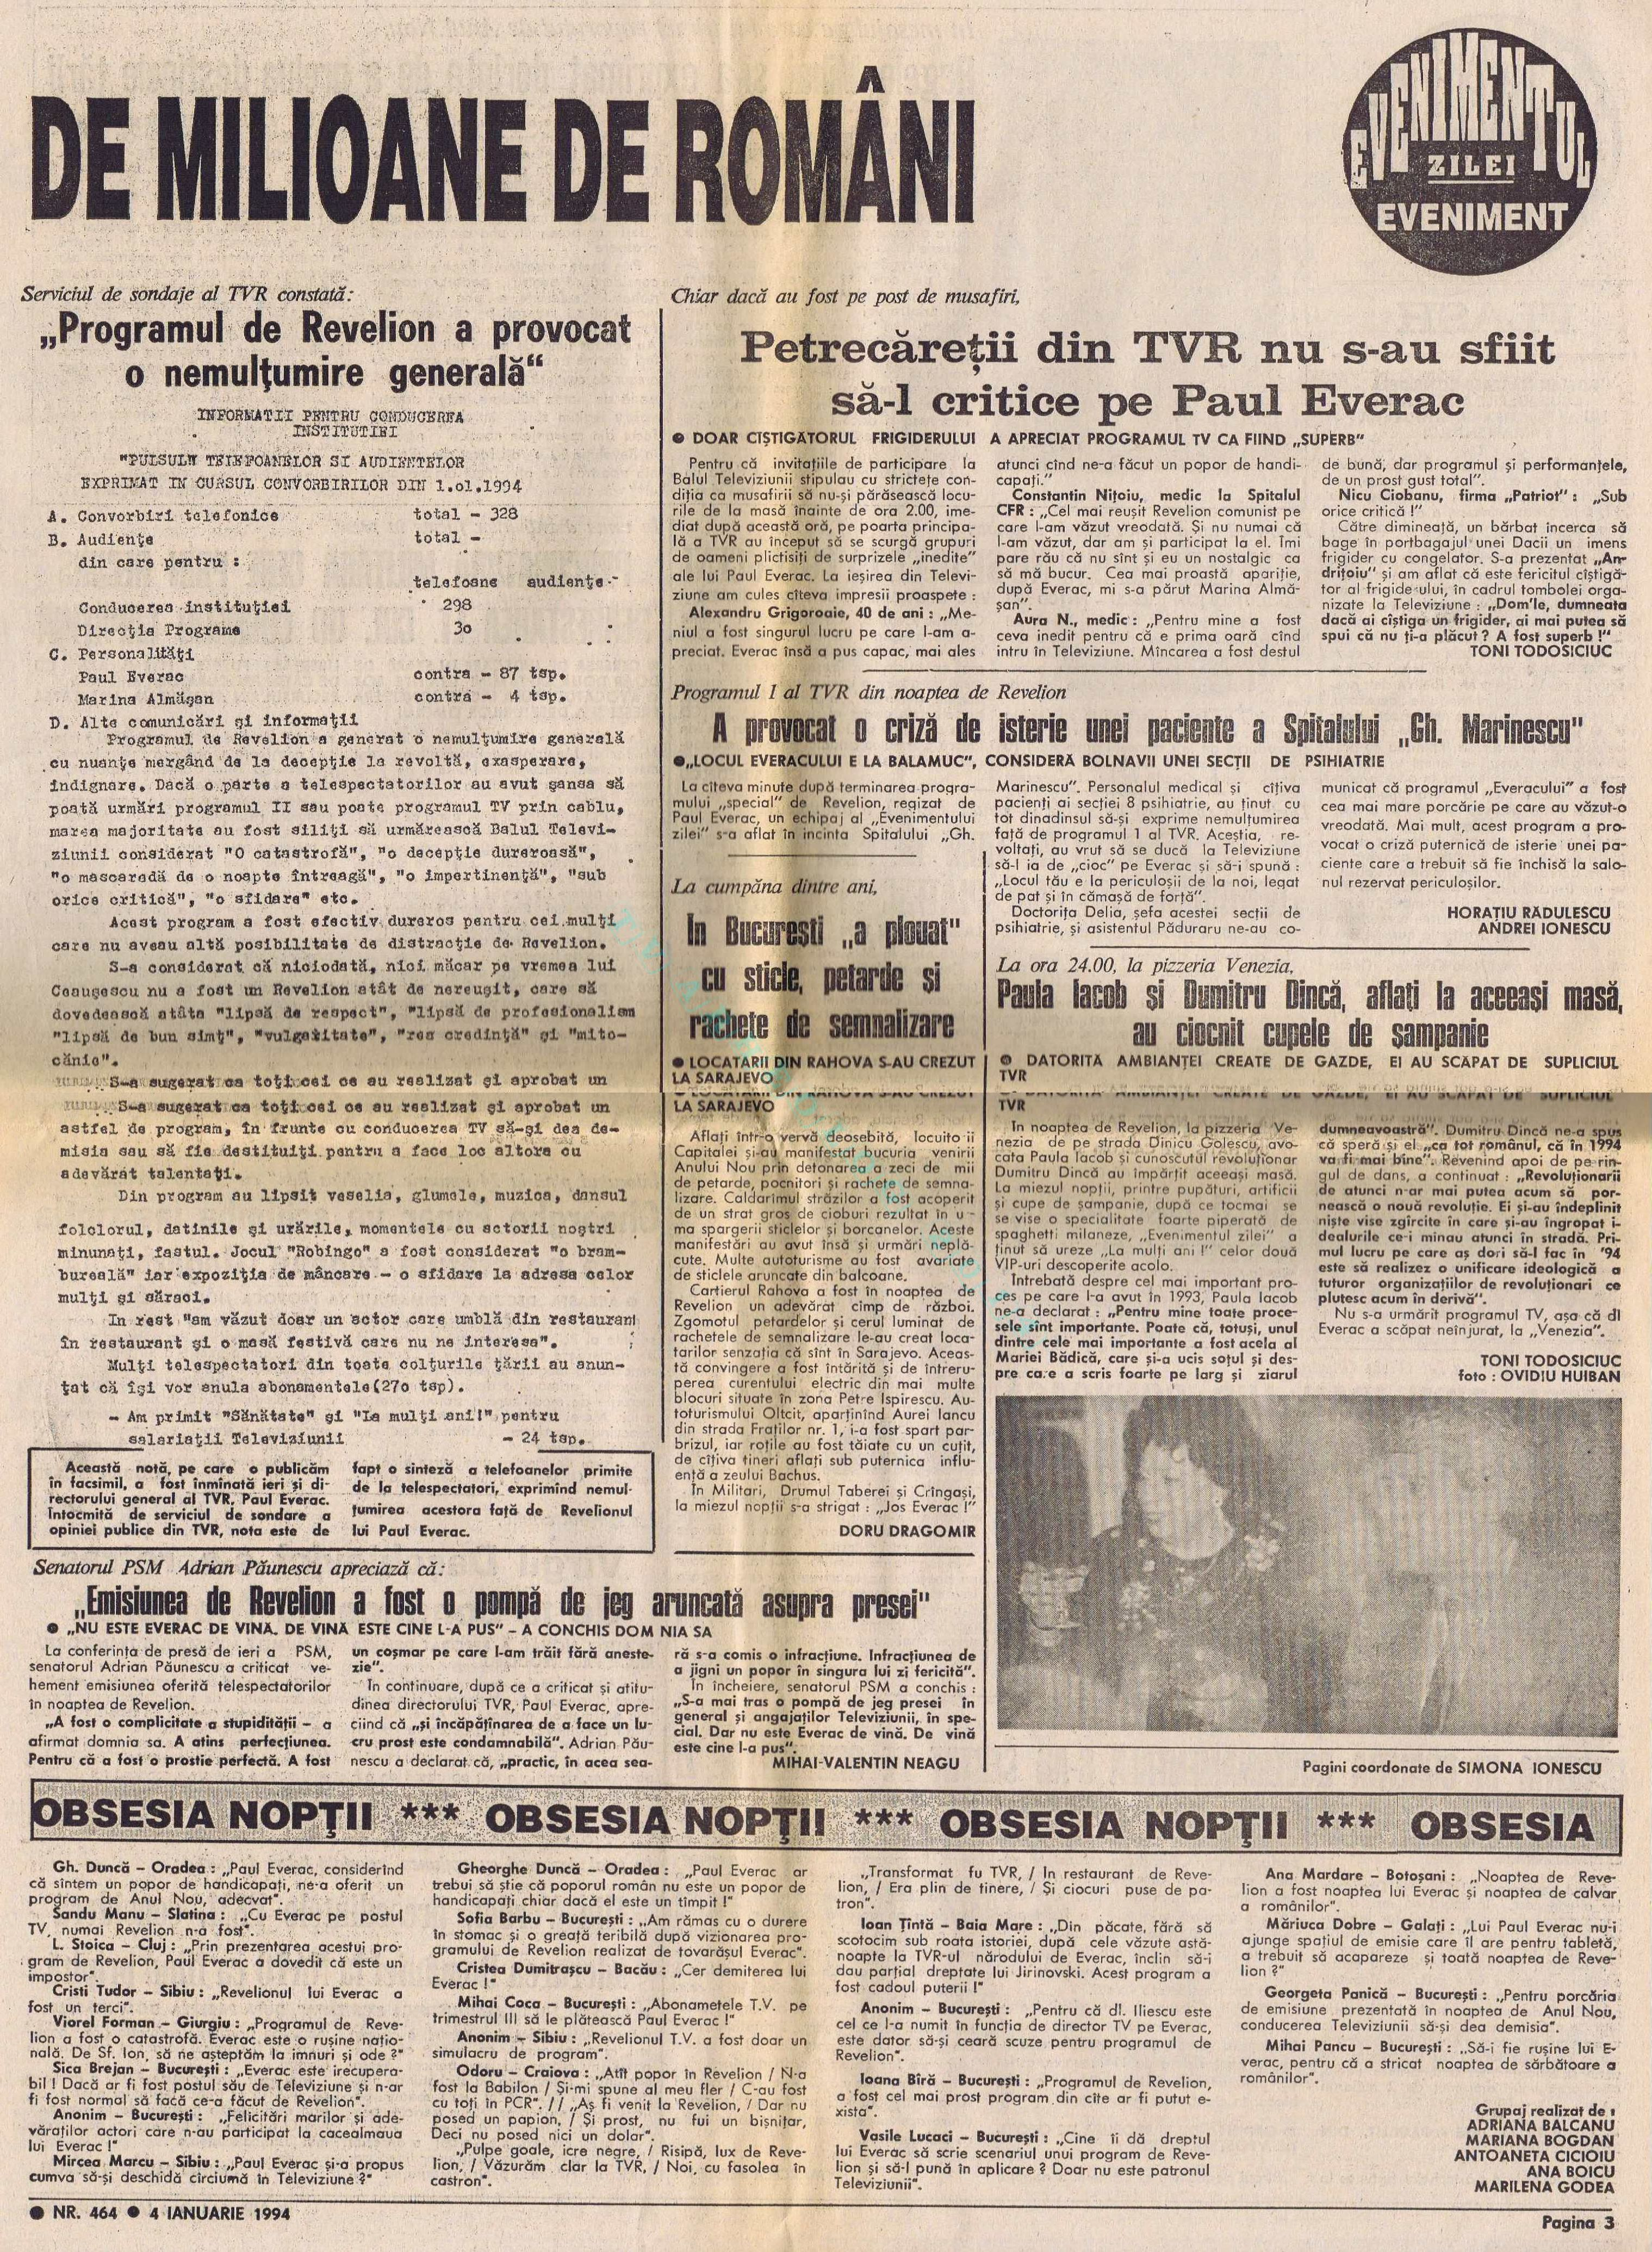 01-04 EvZ Teverac 3